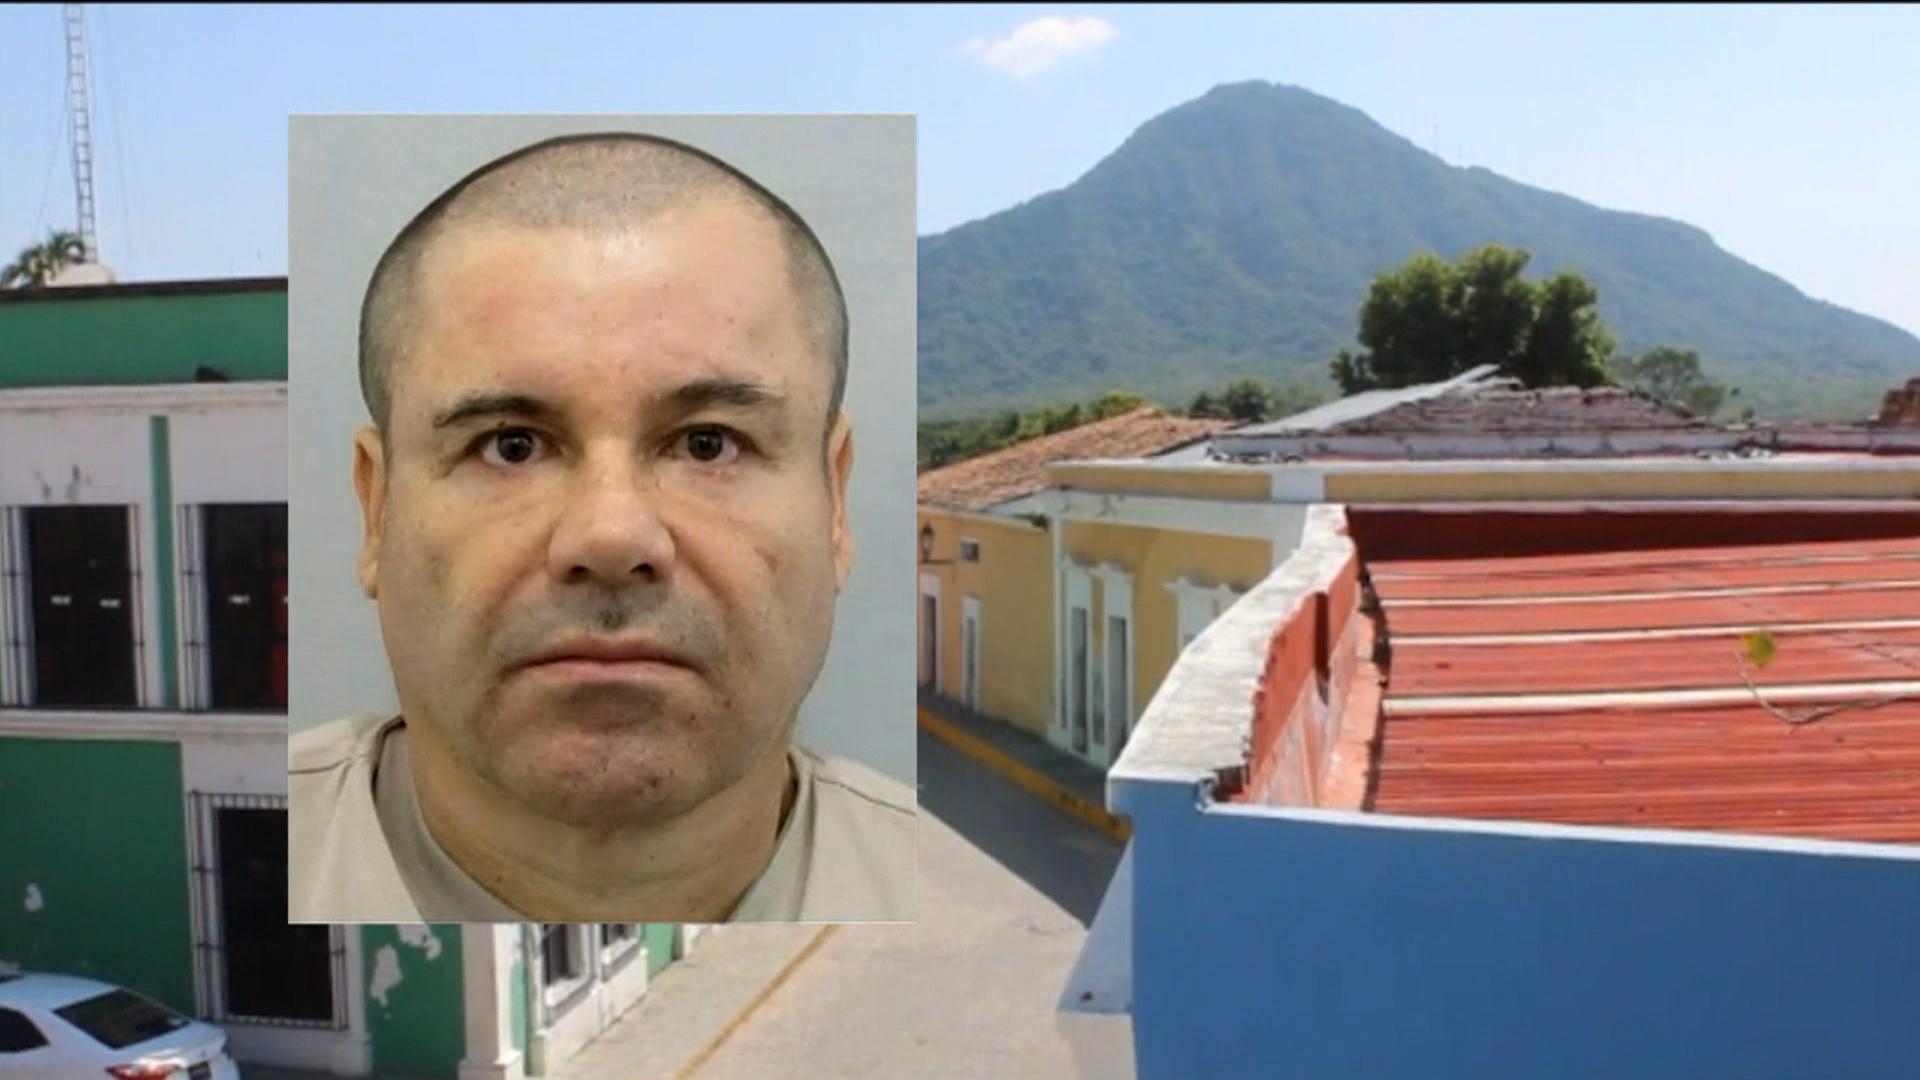 Joaquin 'El Chapo' Guzman May Have Hid in Mexican Mountains: Sources